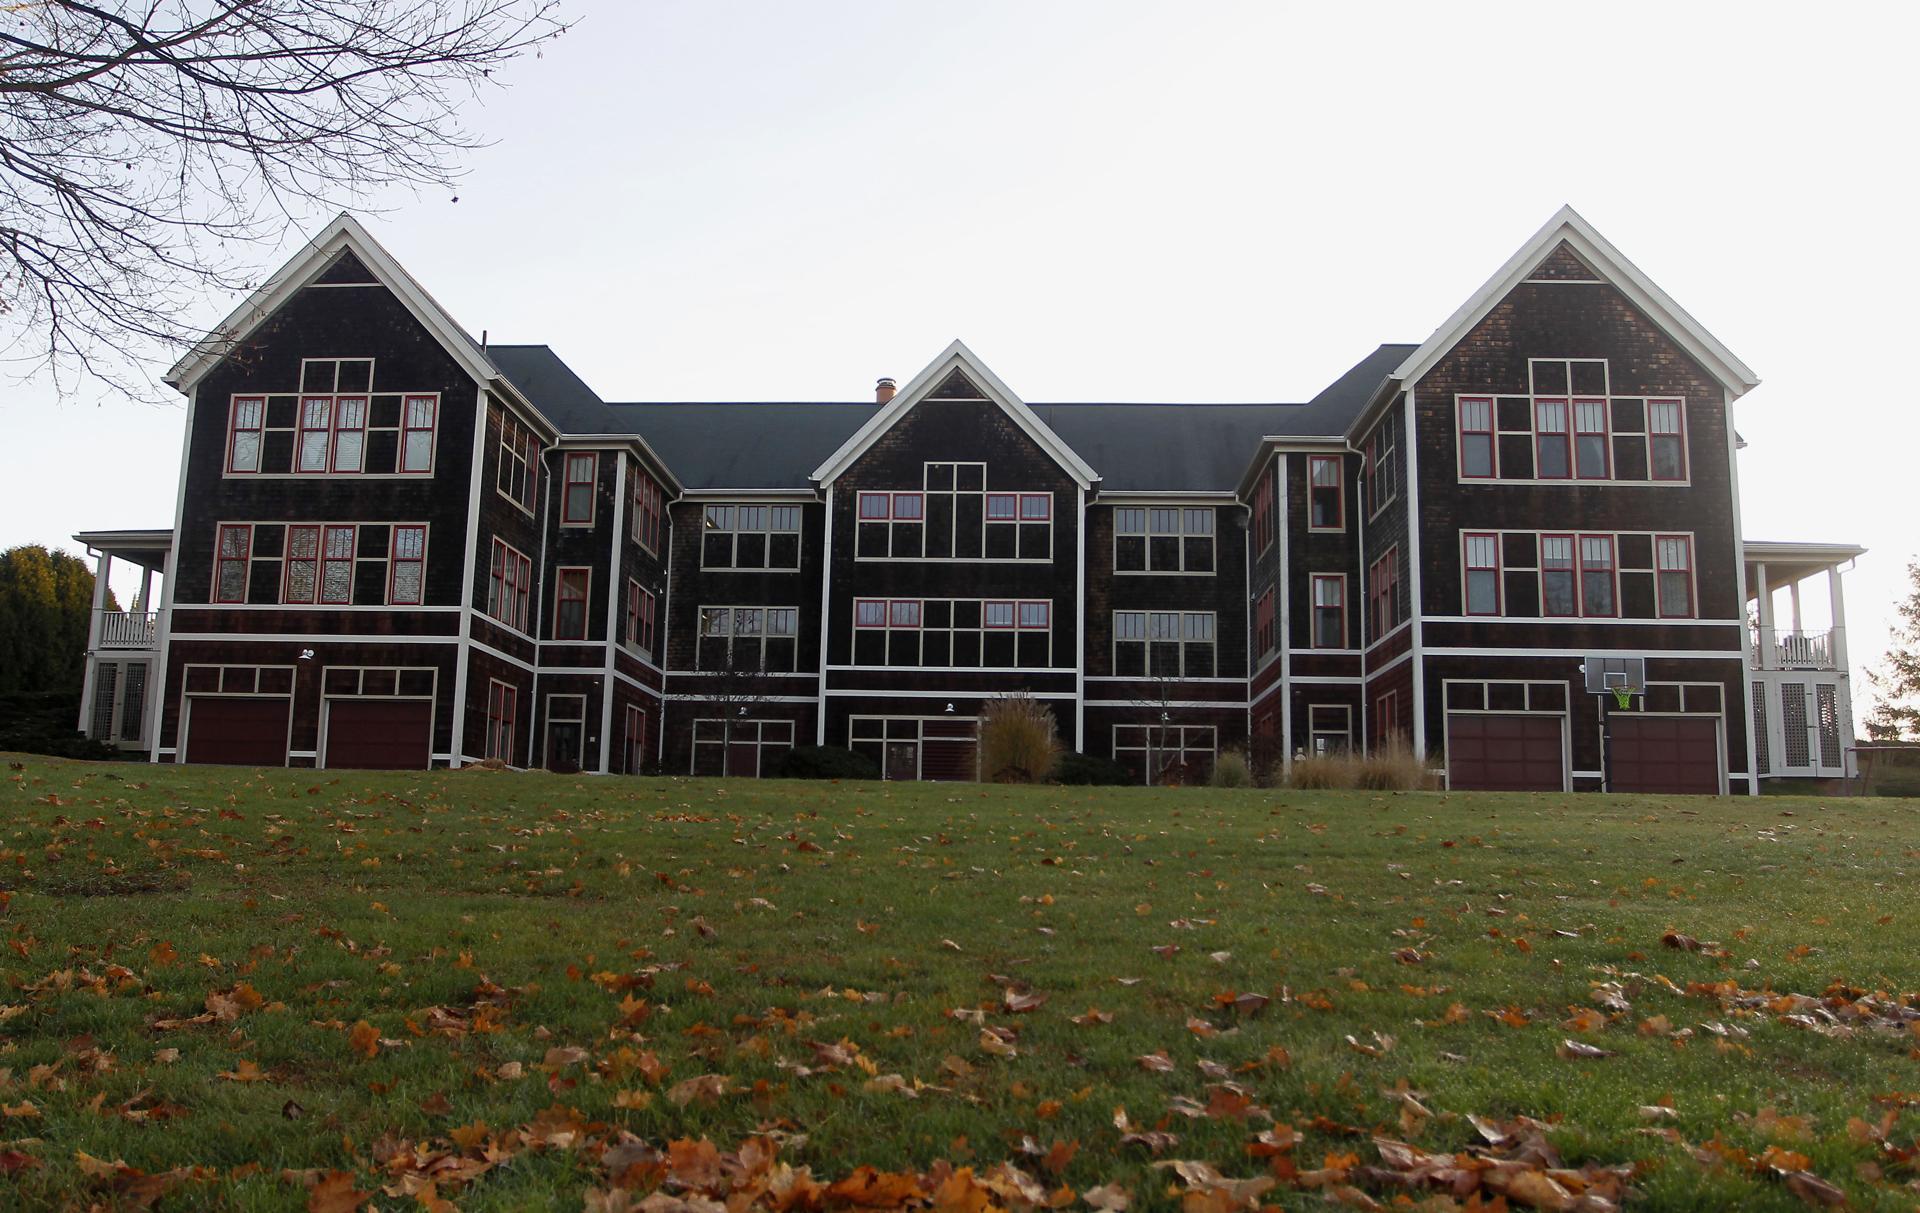 The Zane dormitory at St. George's School.